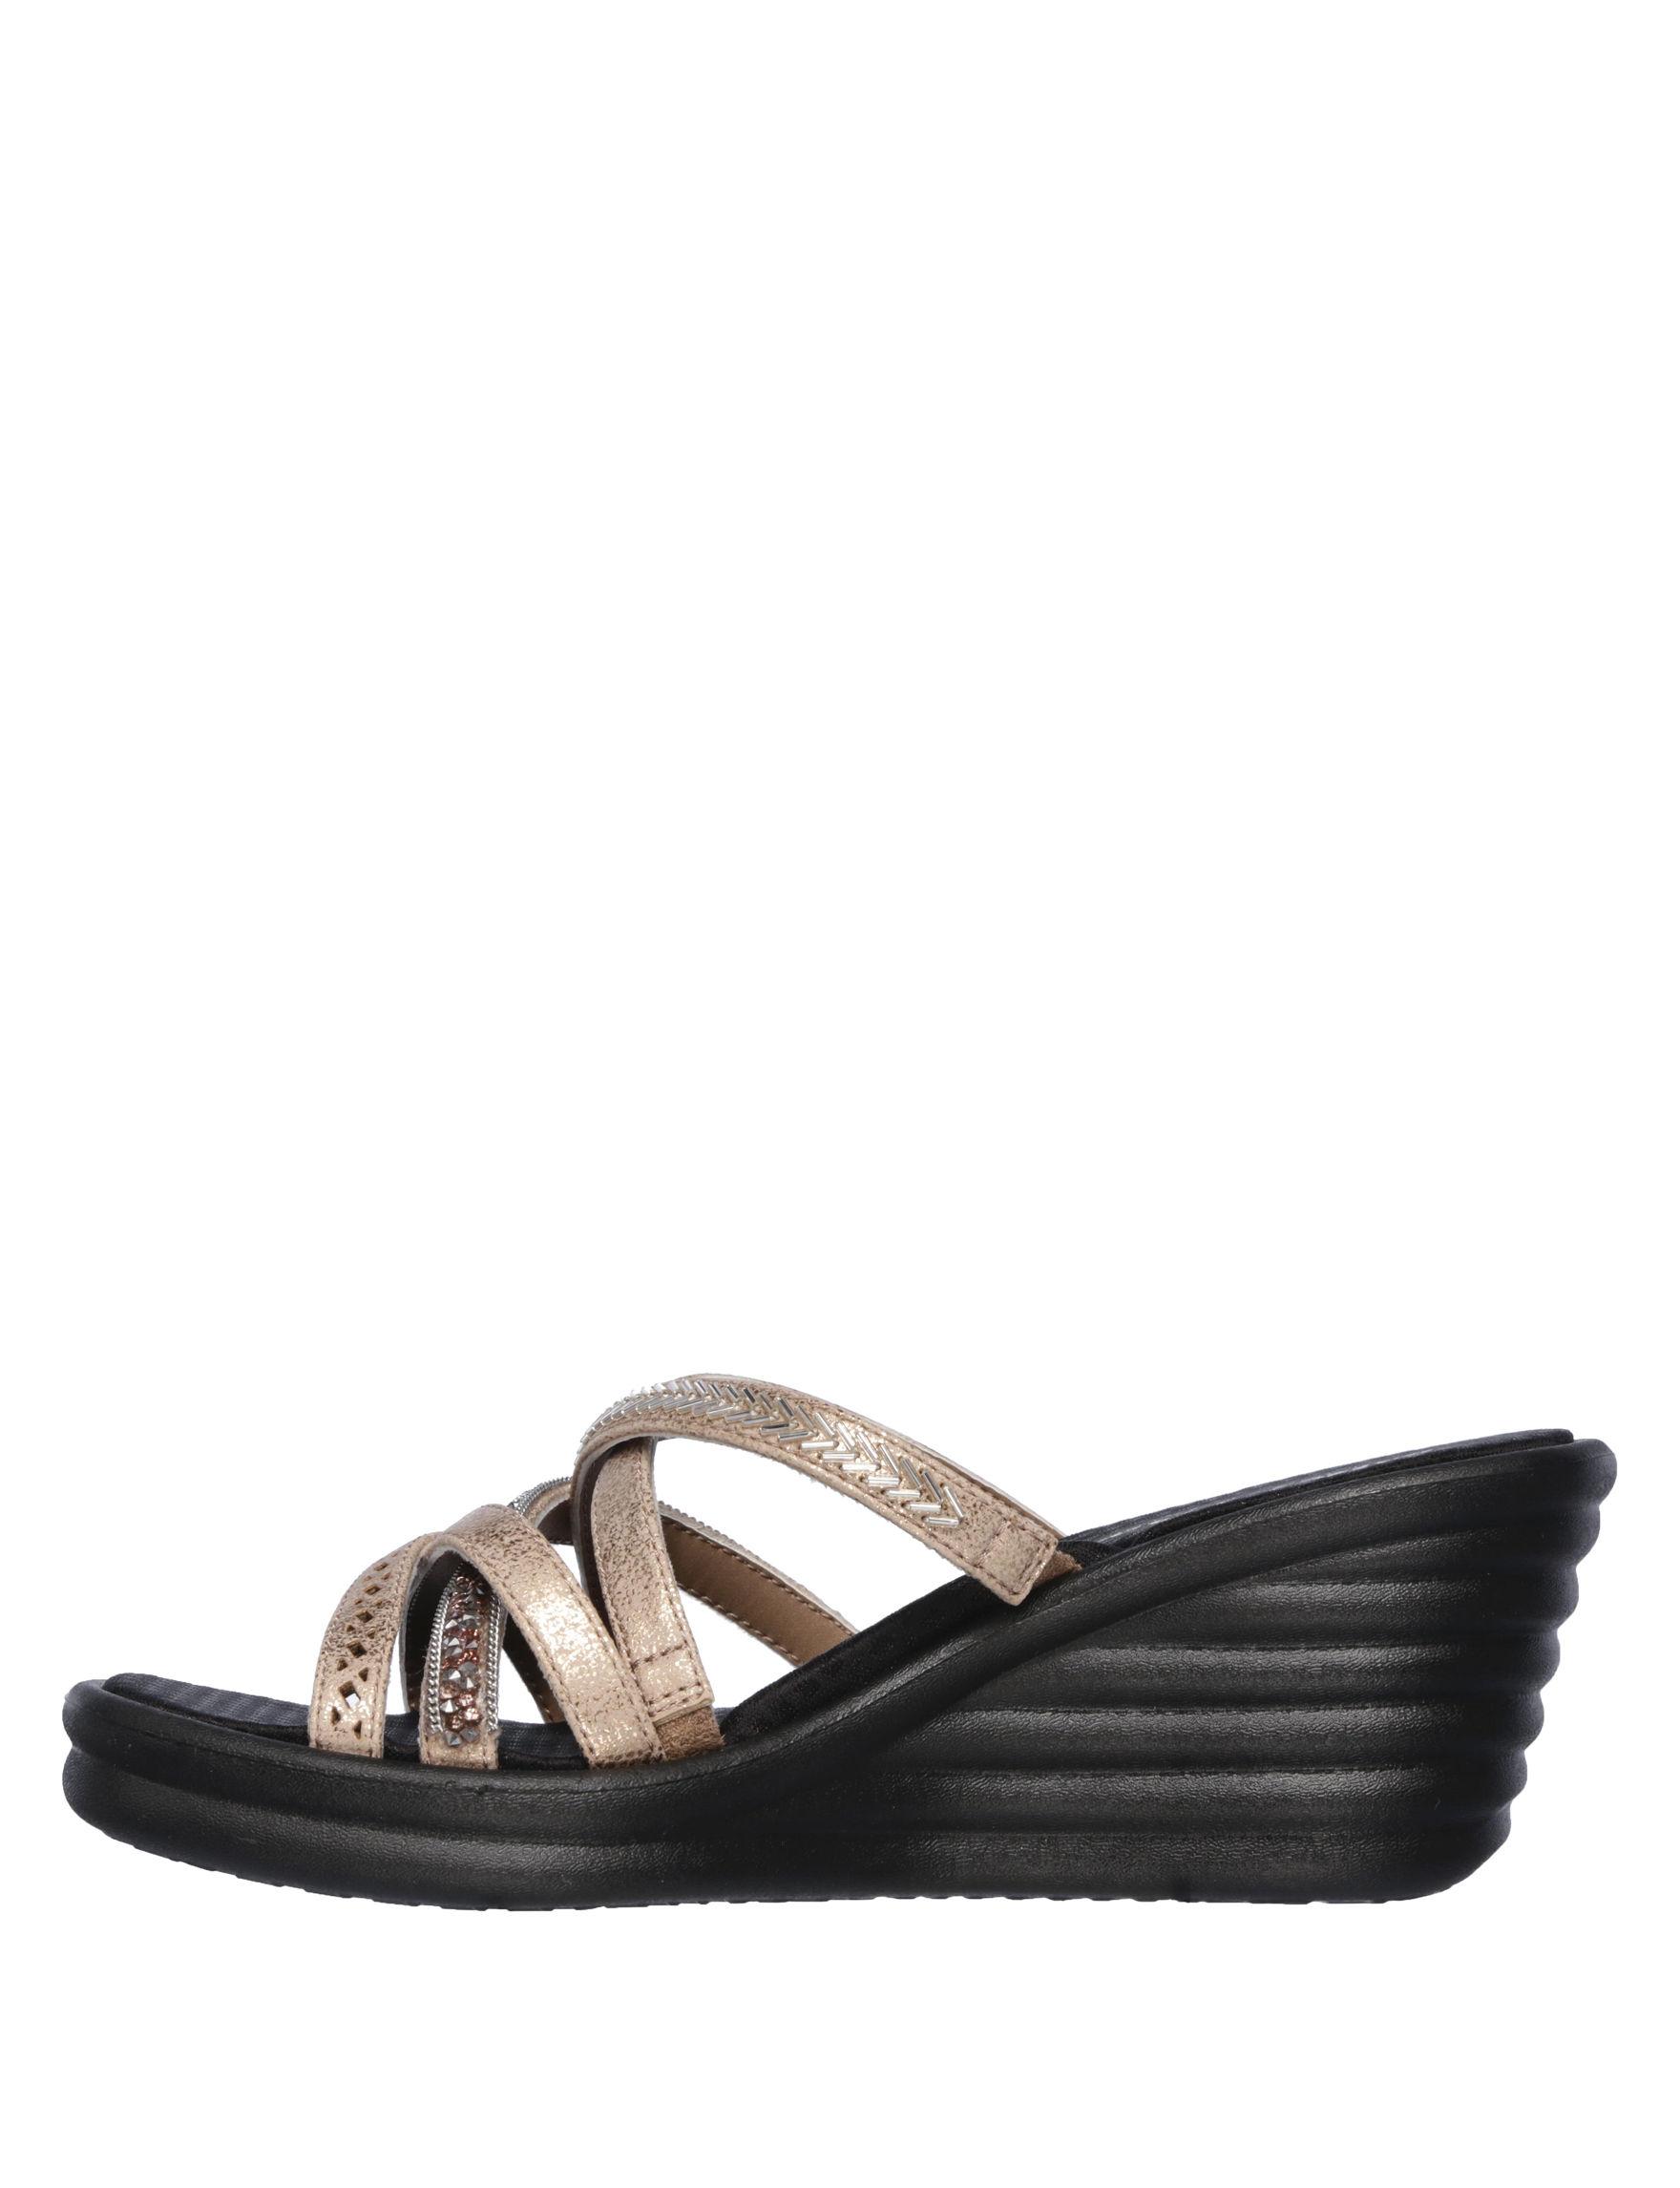 8c9a9c37 Skechers Women's Rumblers Wave New Lassie Wedge Sandals | Stage Stores